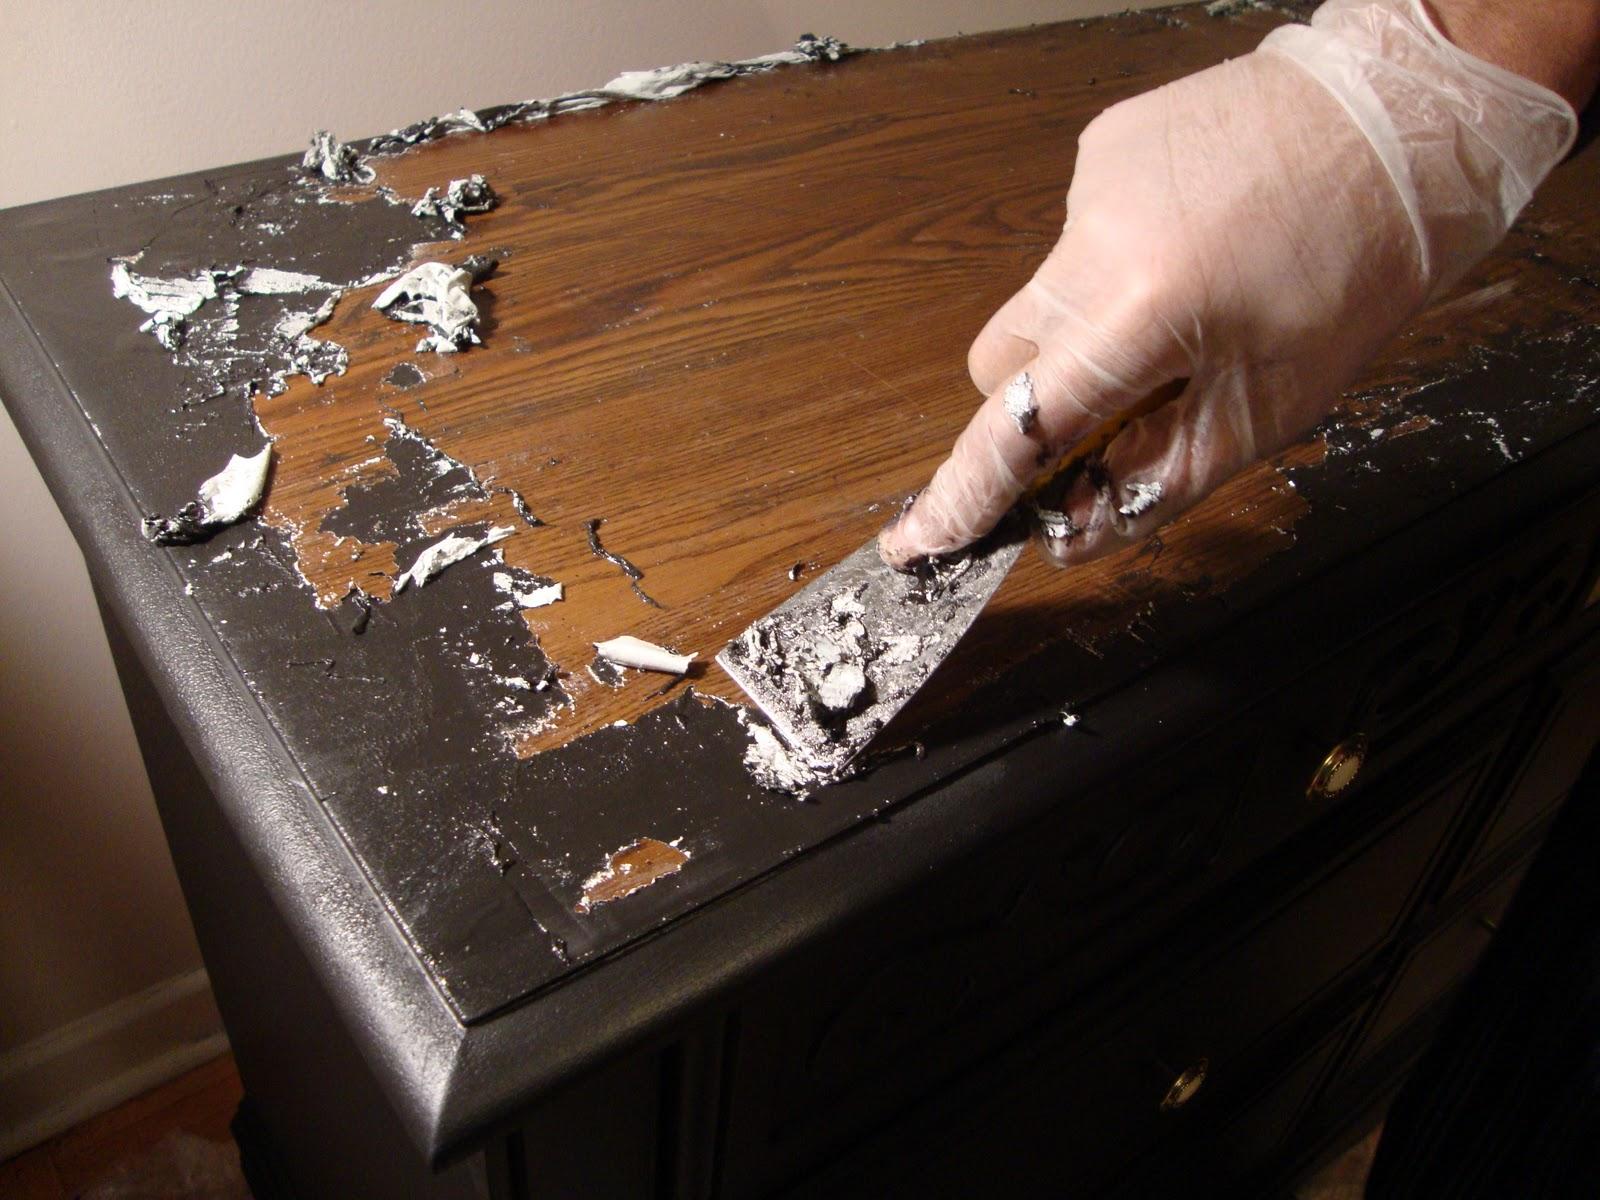 remove paint using a paint stripper